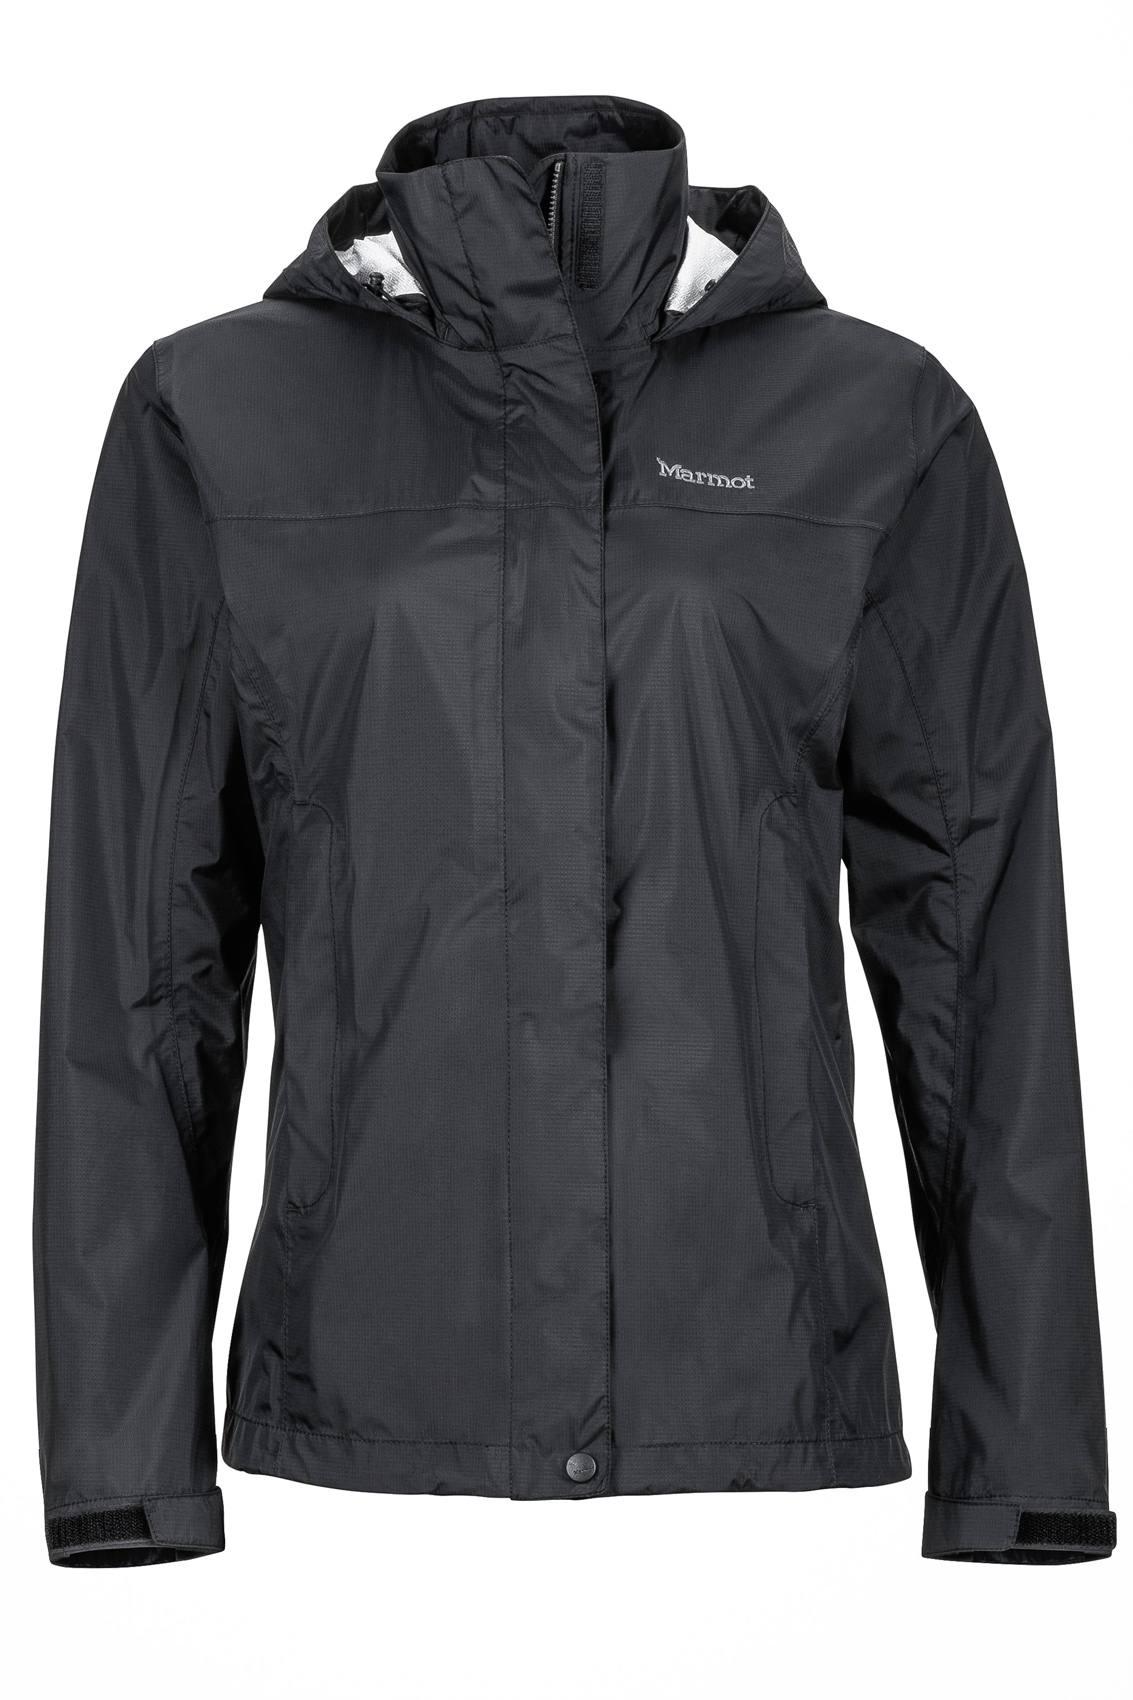 Marmot Women S Alexie Jacket: Marmot Precip Women's Jacket